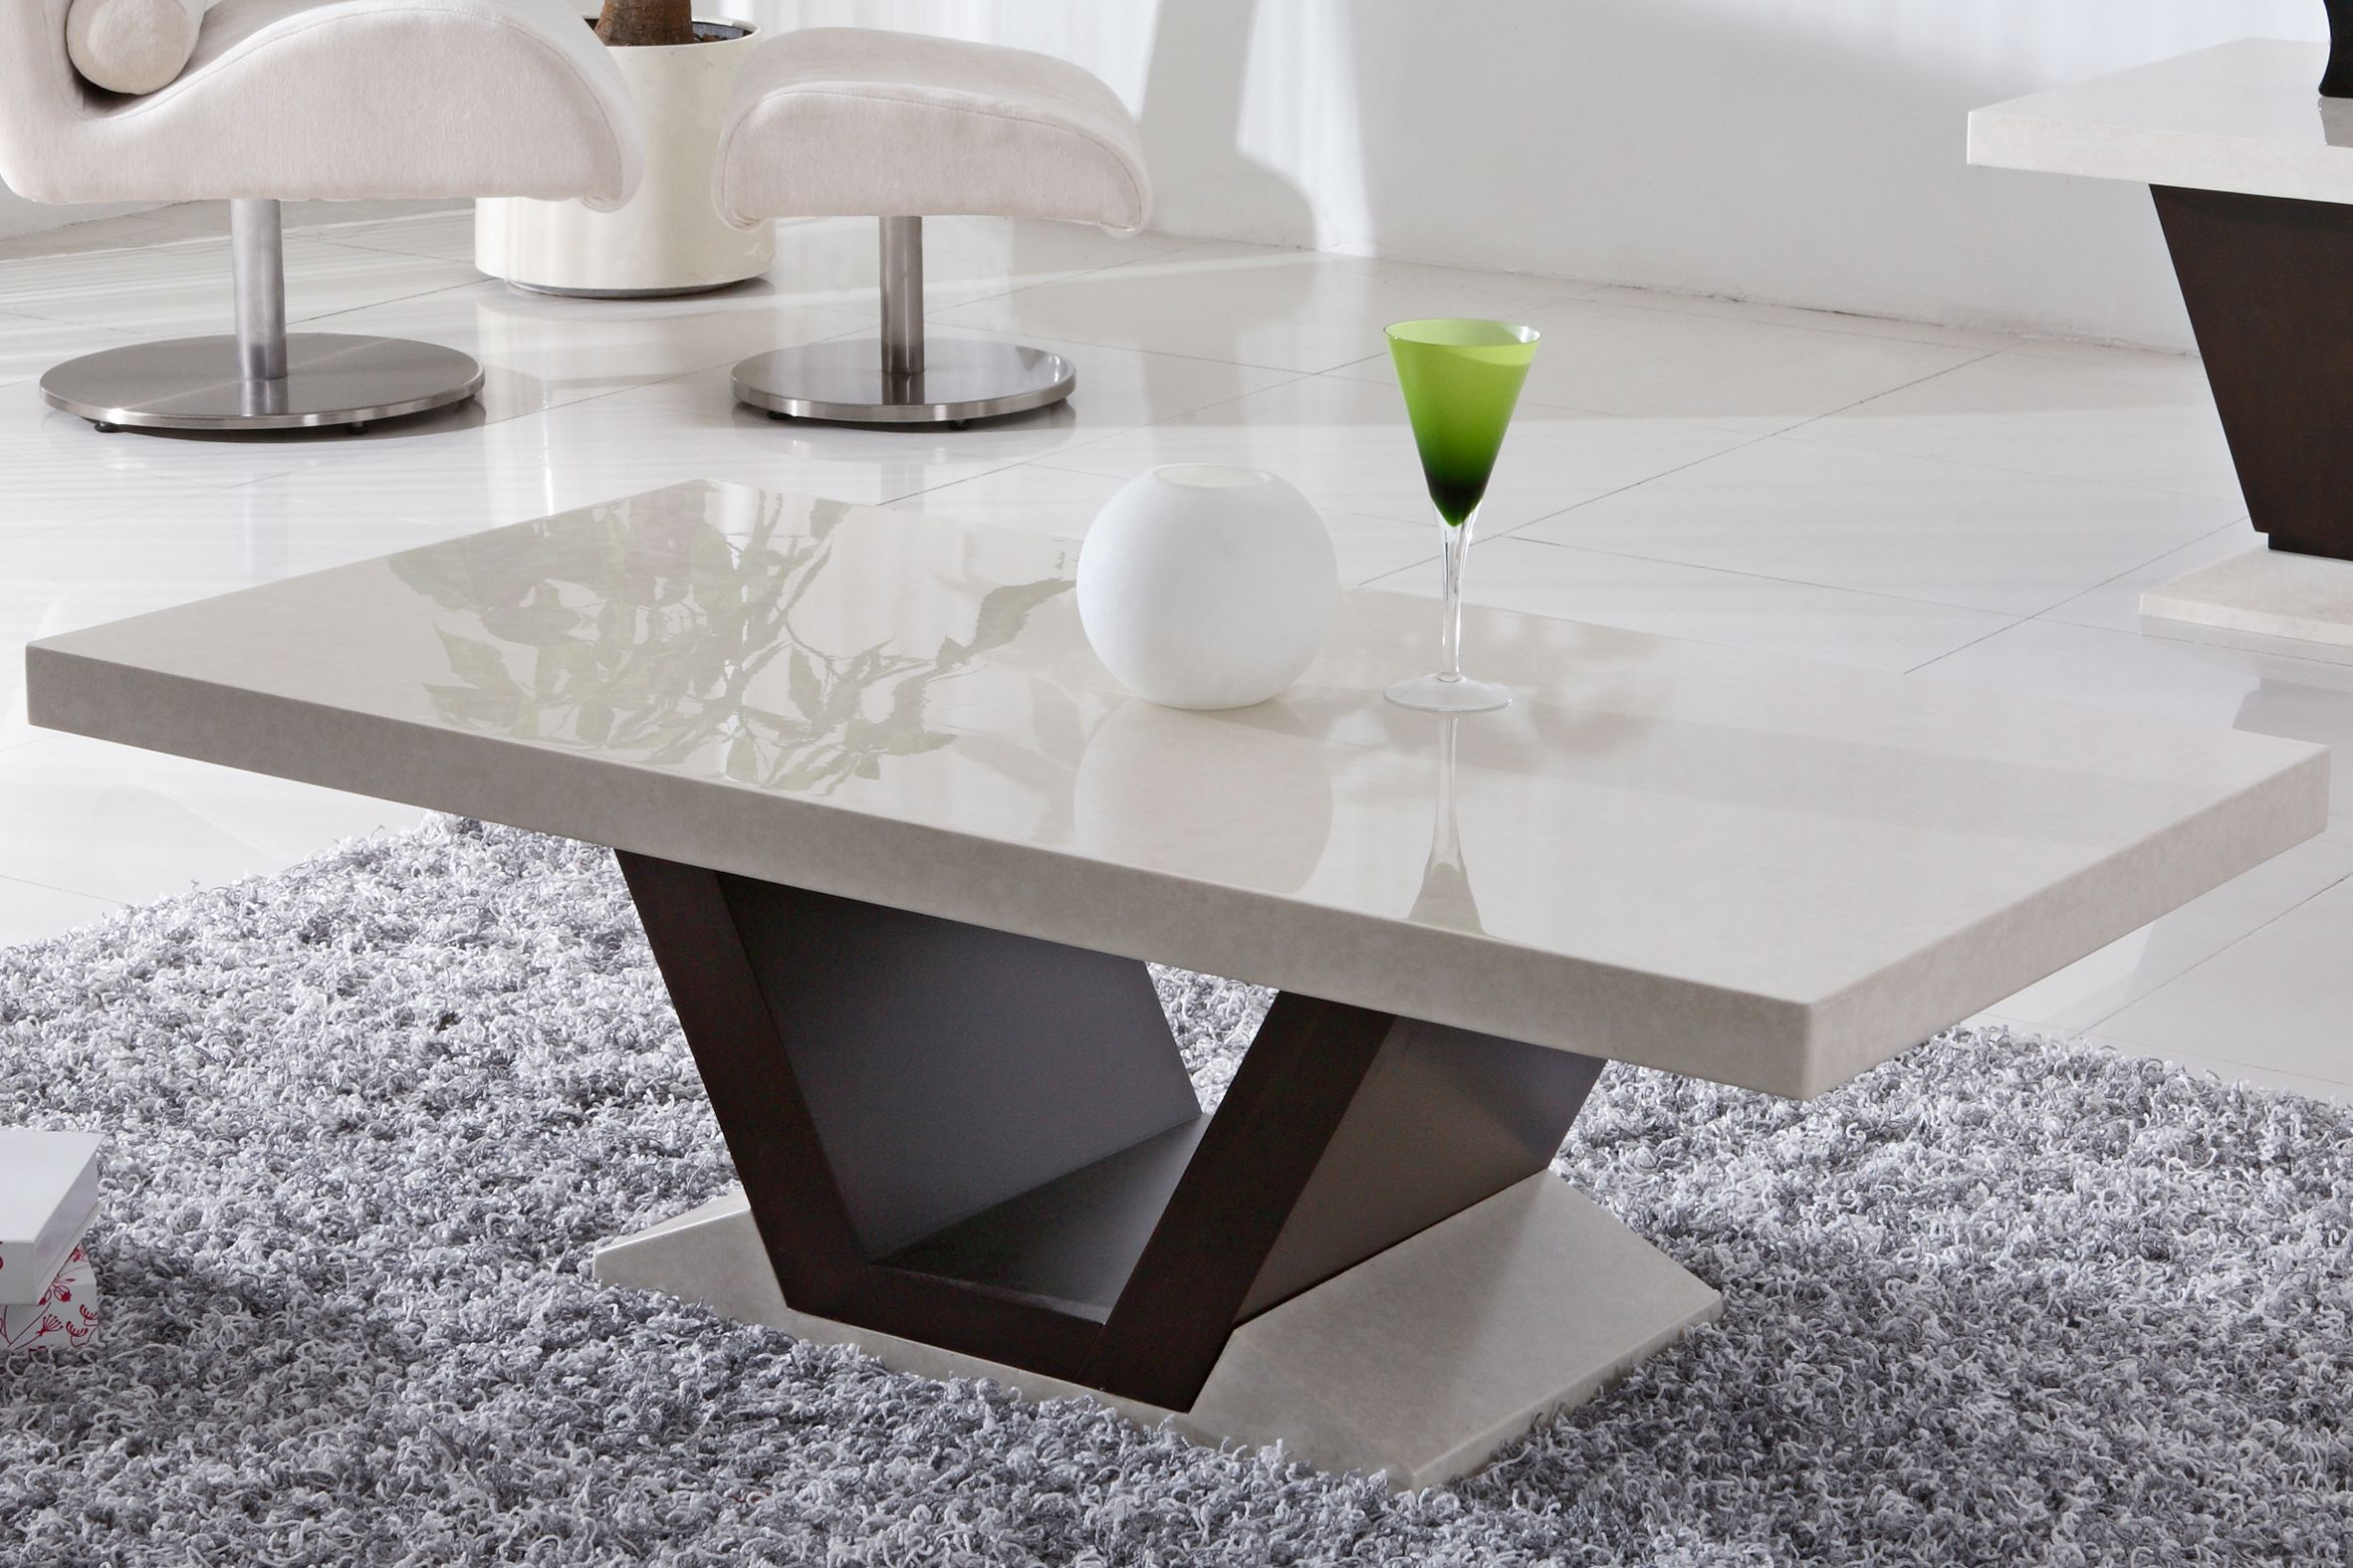 Marble Coffee Table Tlpctex D Sko Dining Table Marble White Coffee Table Modern Home Coffee Tables [ 1575 x 2363 Pixel ]